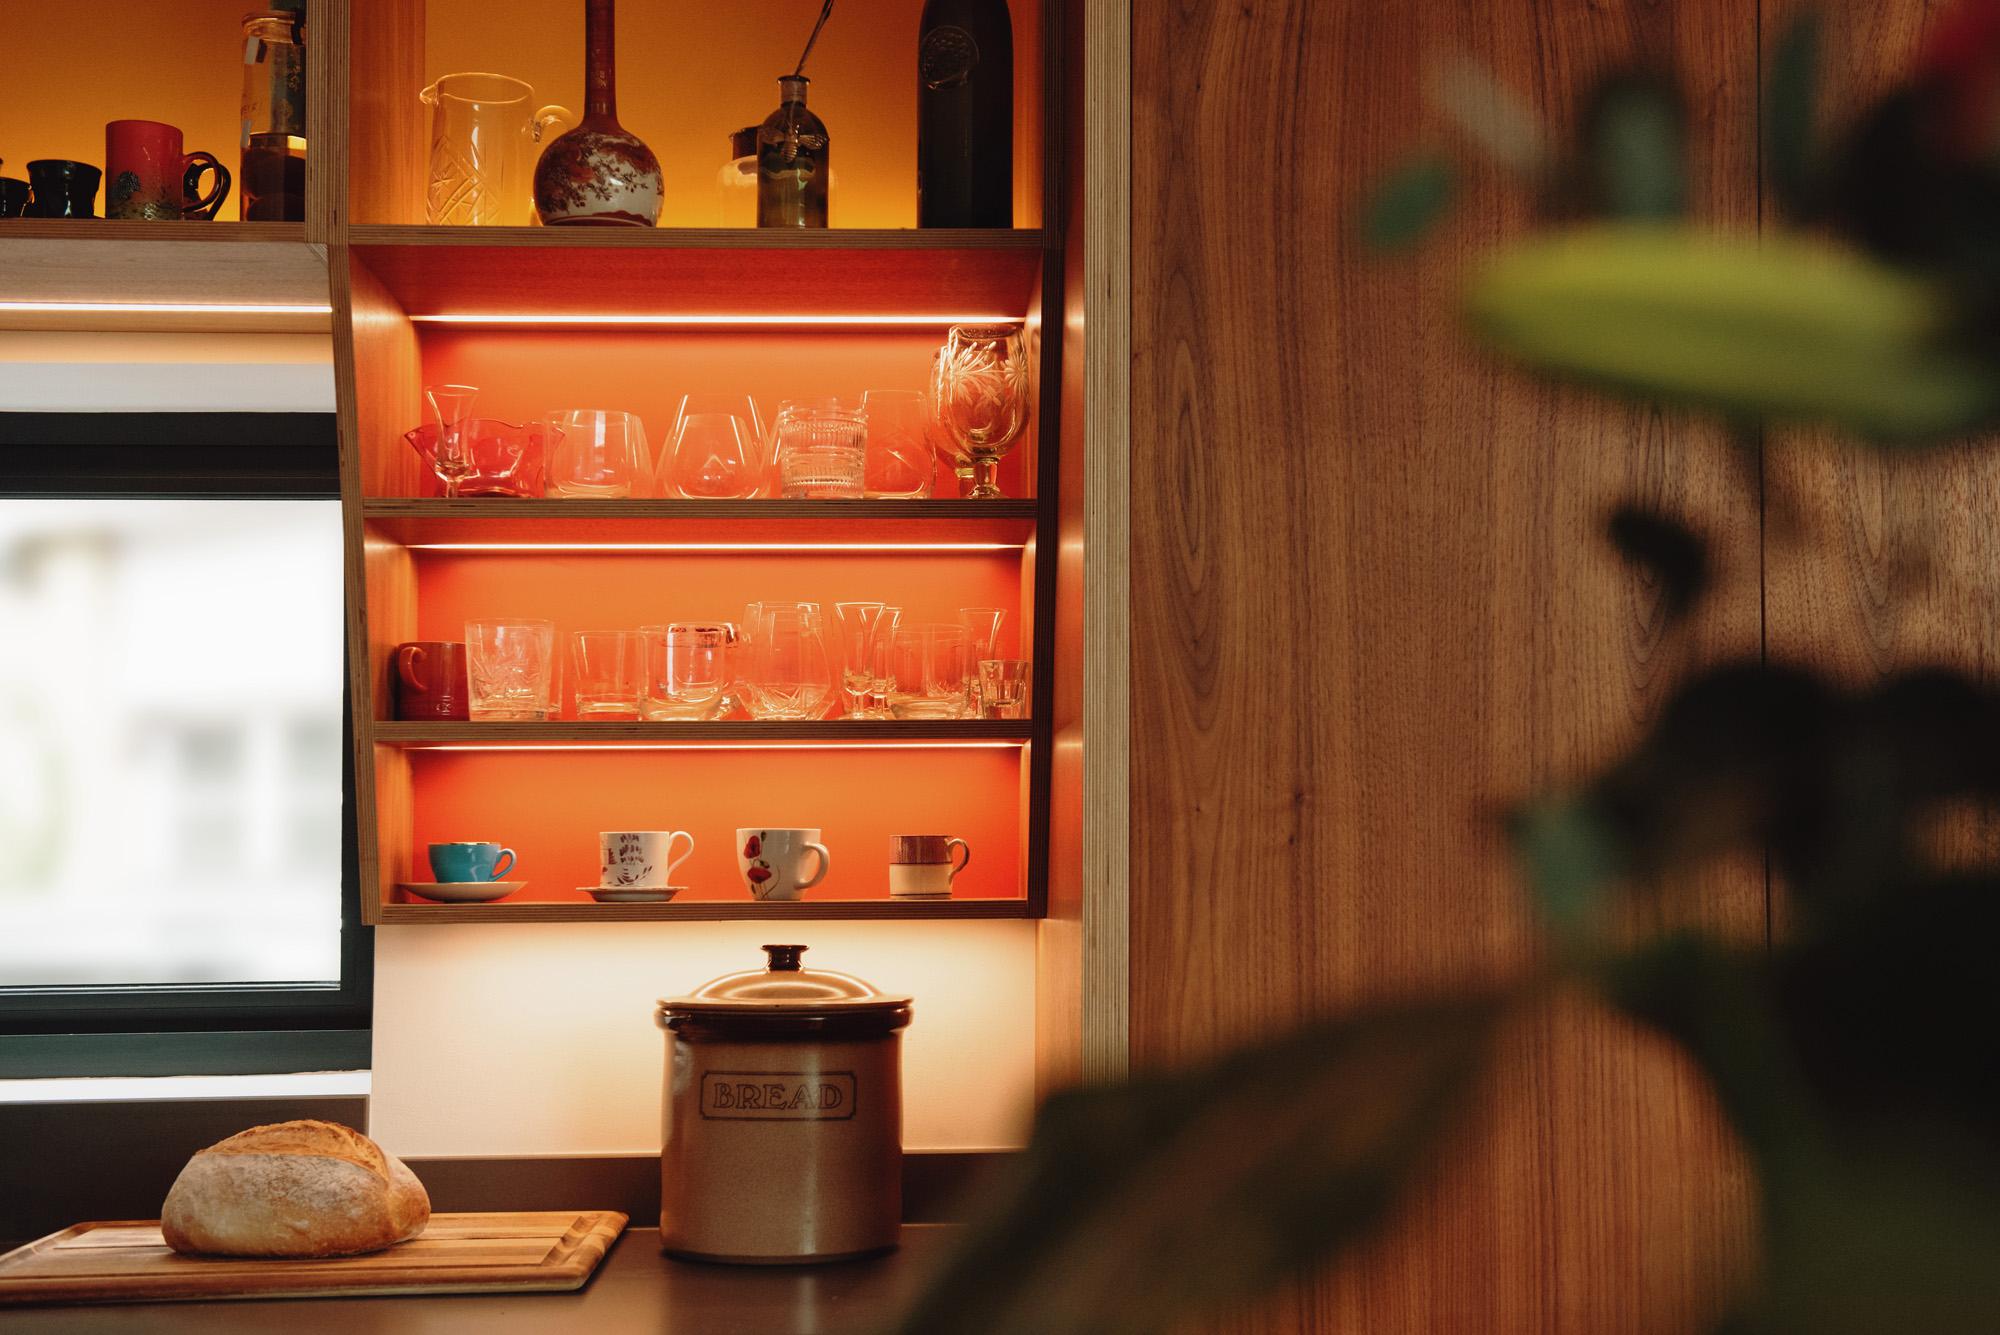 illuminated kitchen shelving displaying glassware